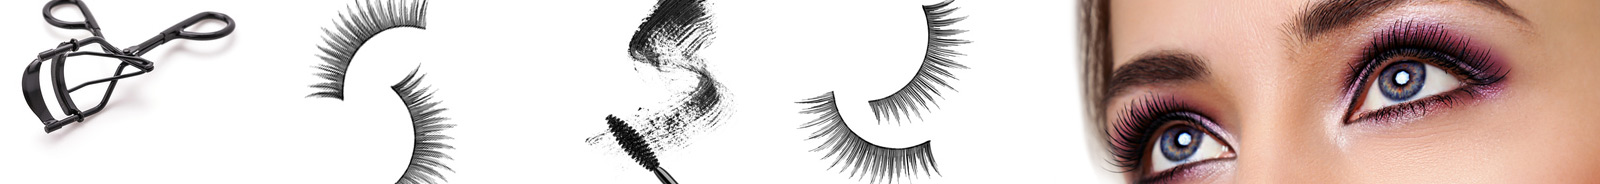 subcat-lashes-final.jpg